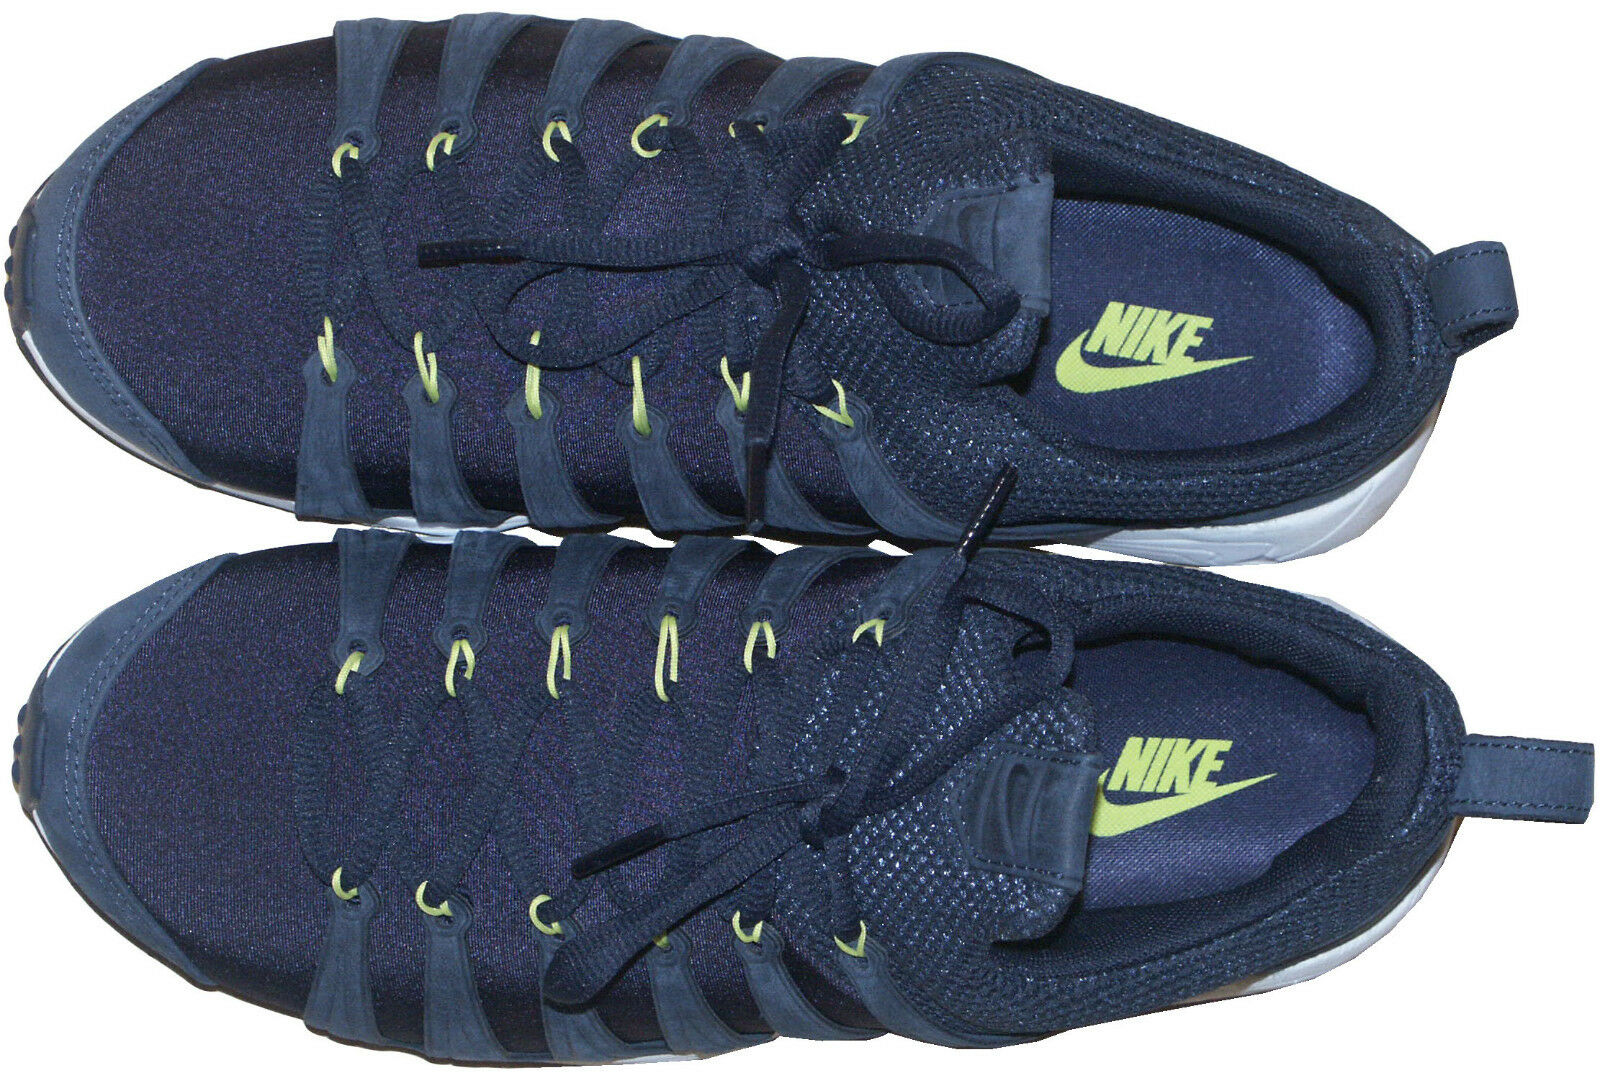 Nike air zoom / spirimic leichte marine ausbilder / zoom schuhe selten sz: uk8 eu42.5 us9 53778e